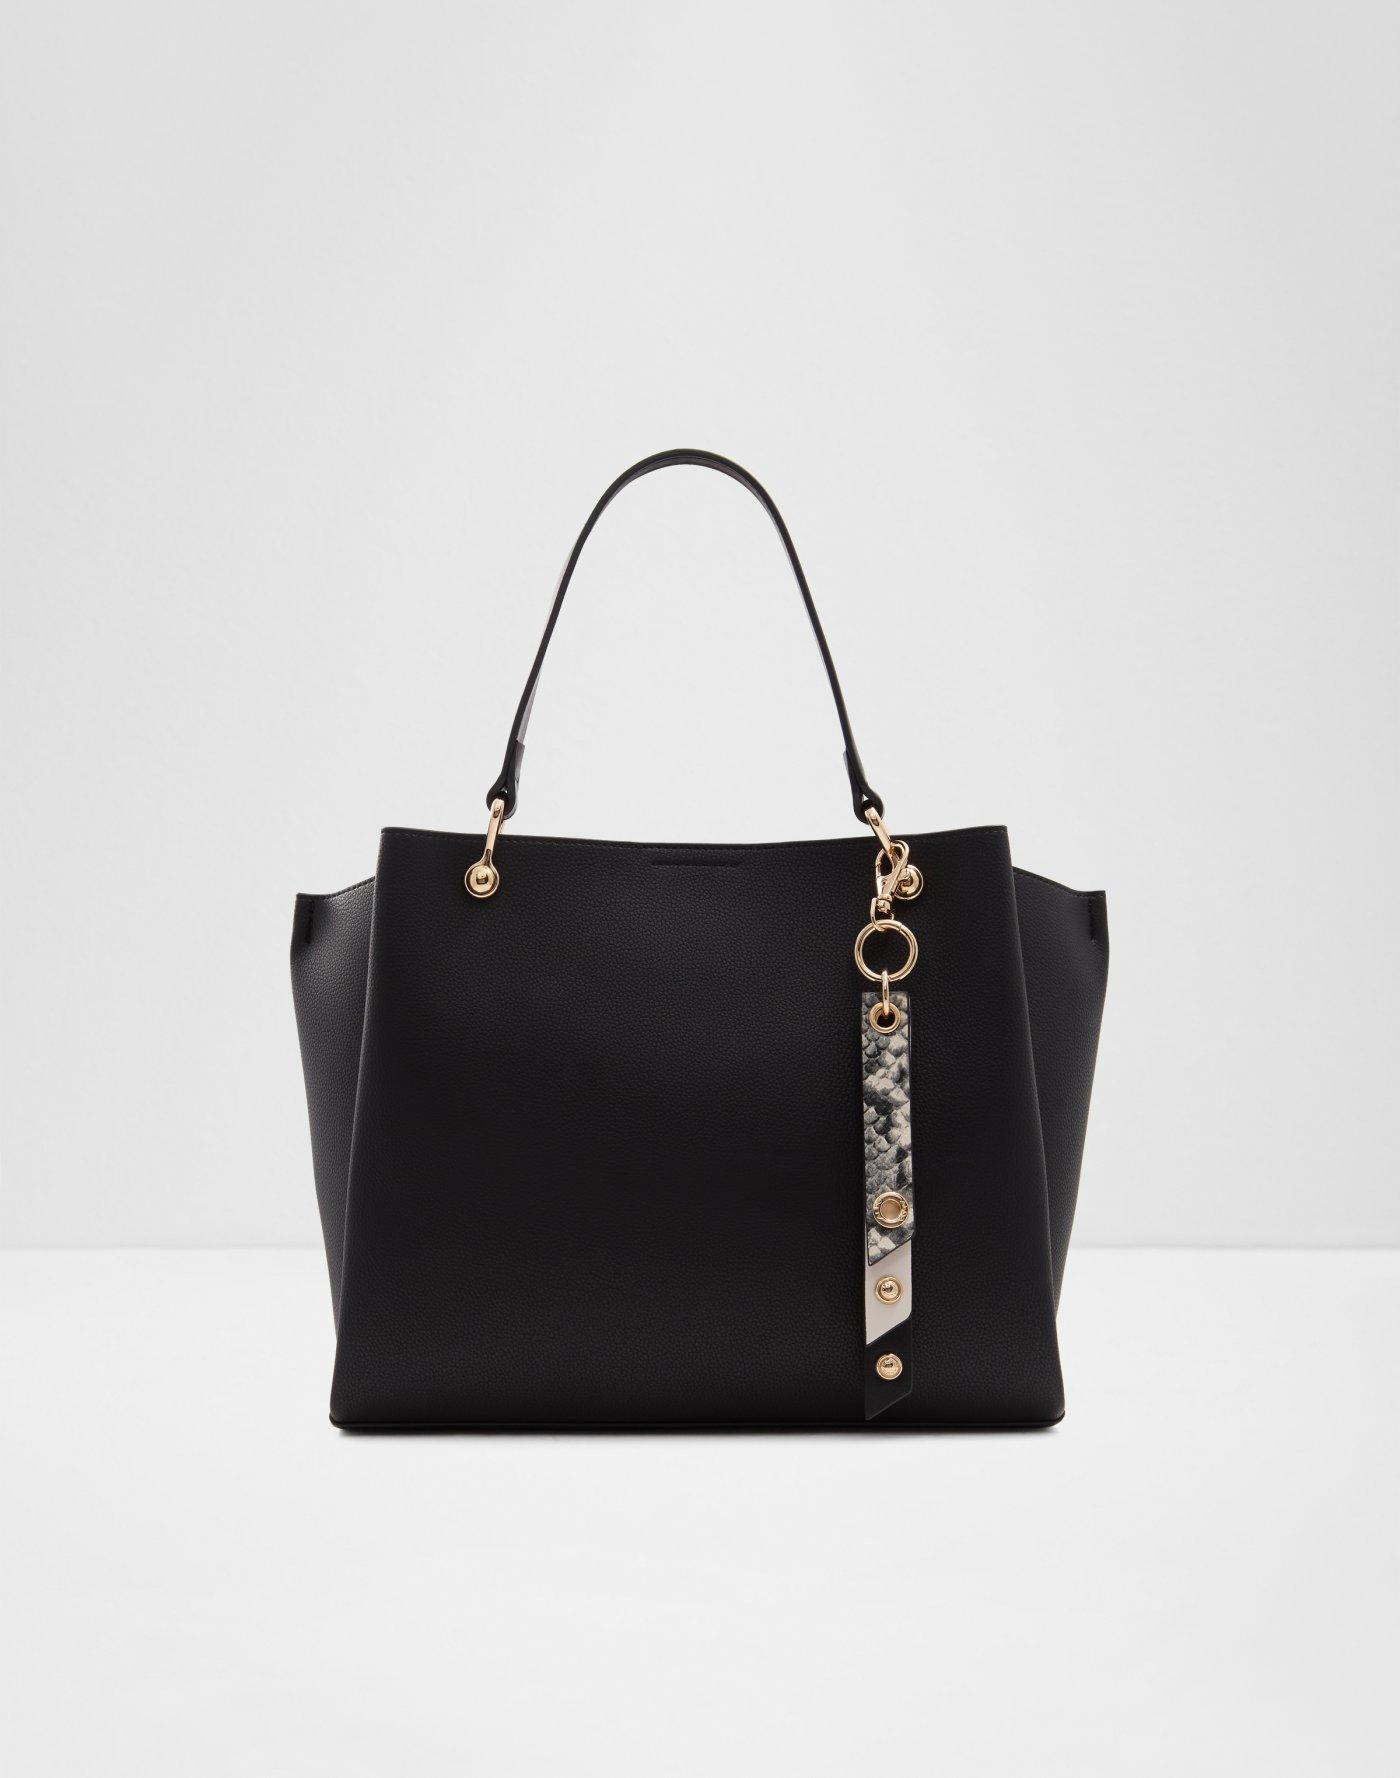 fef692aae63 All Handbags | Aldoshoes.com US